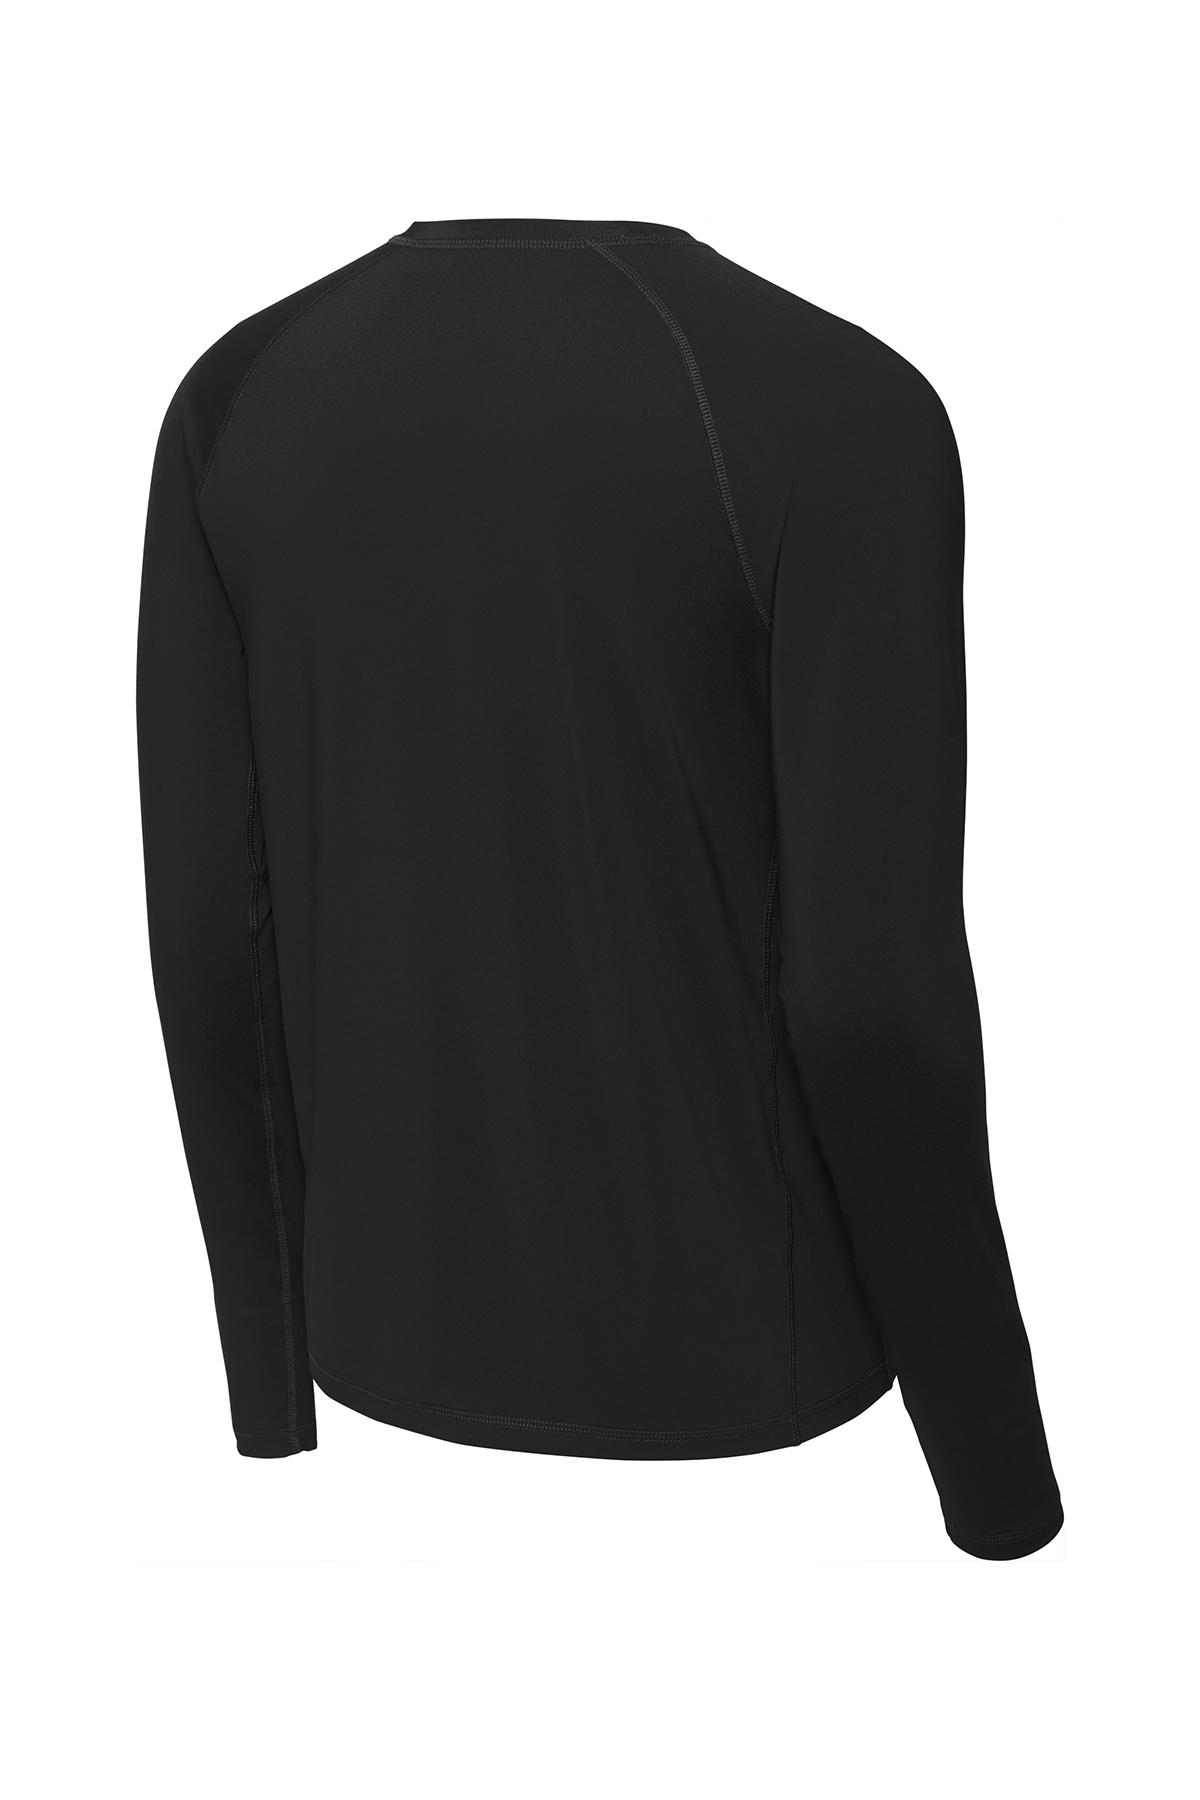 Sport-Tek Long Sleeve Rashguard Tee ST470LS